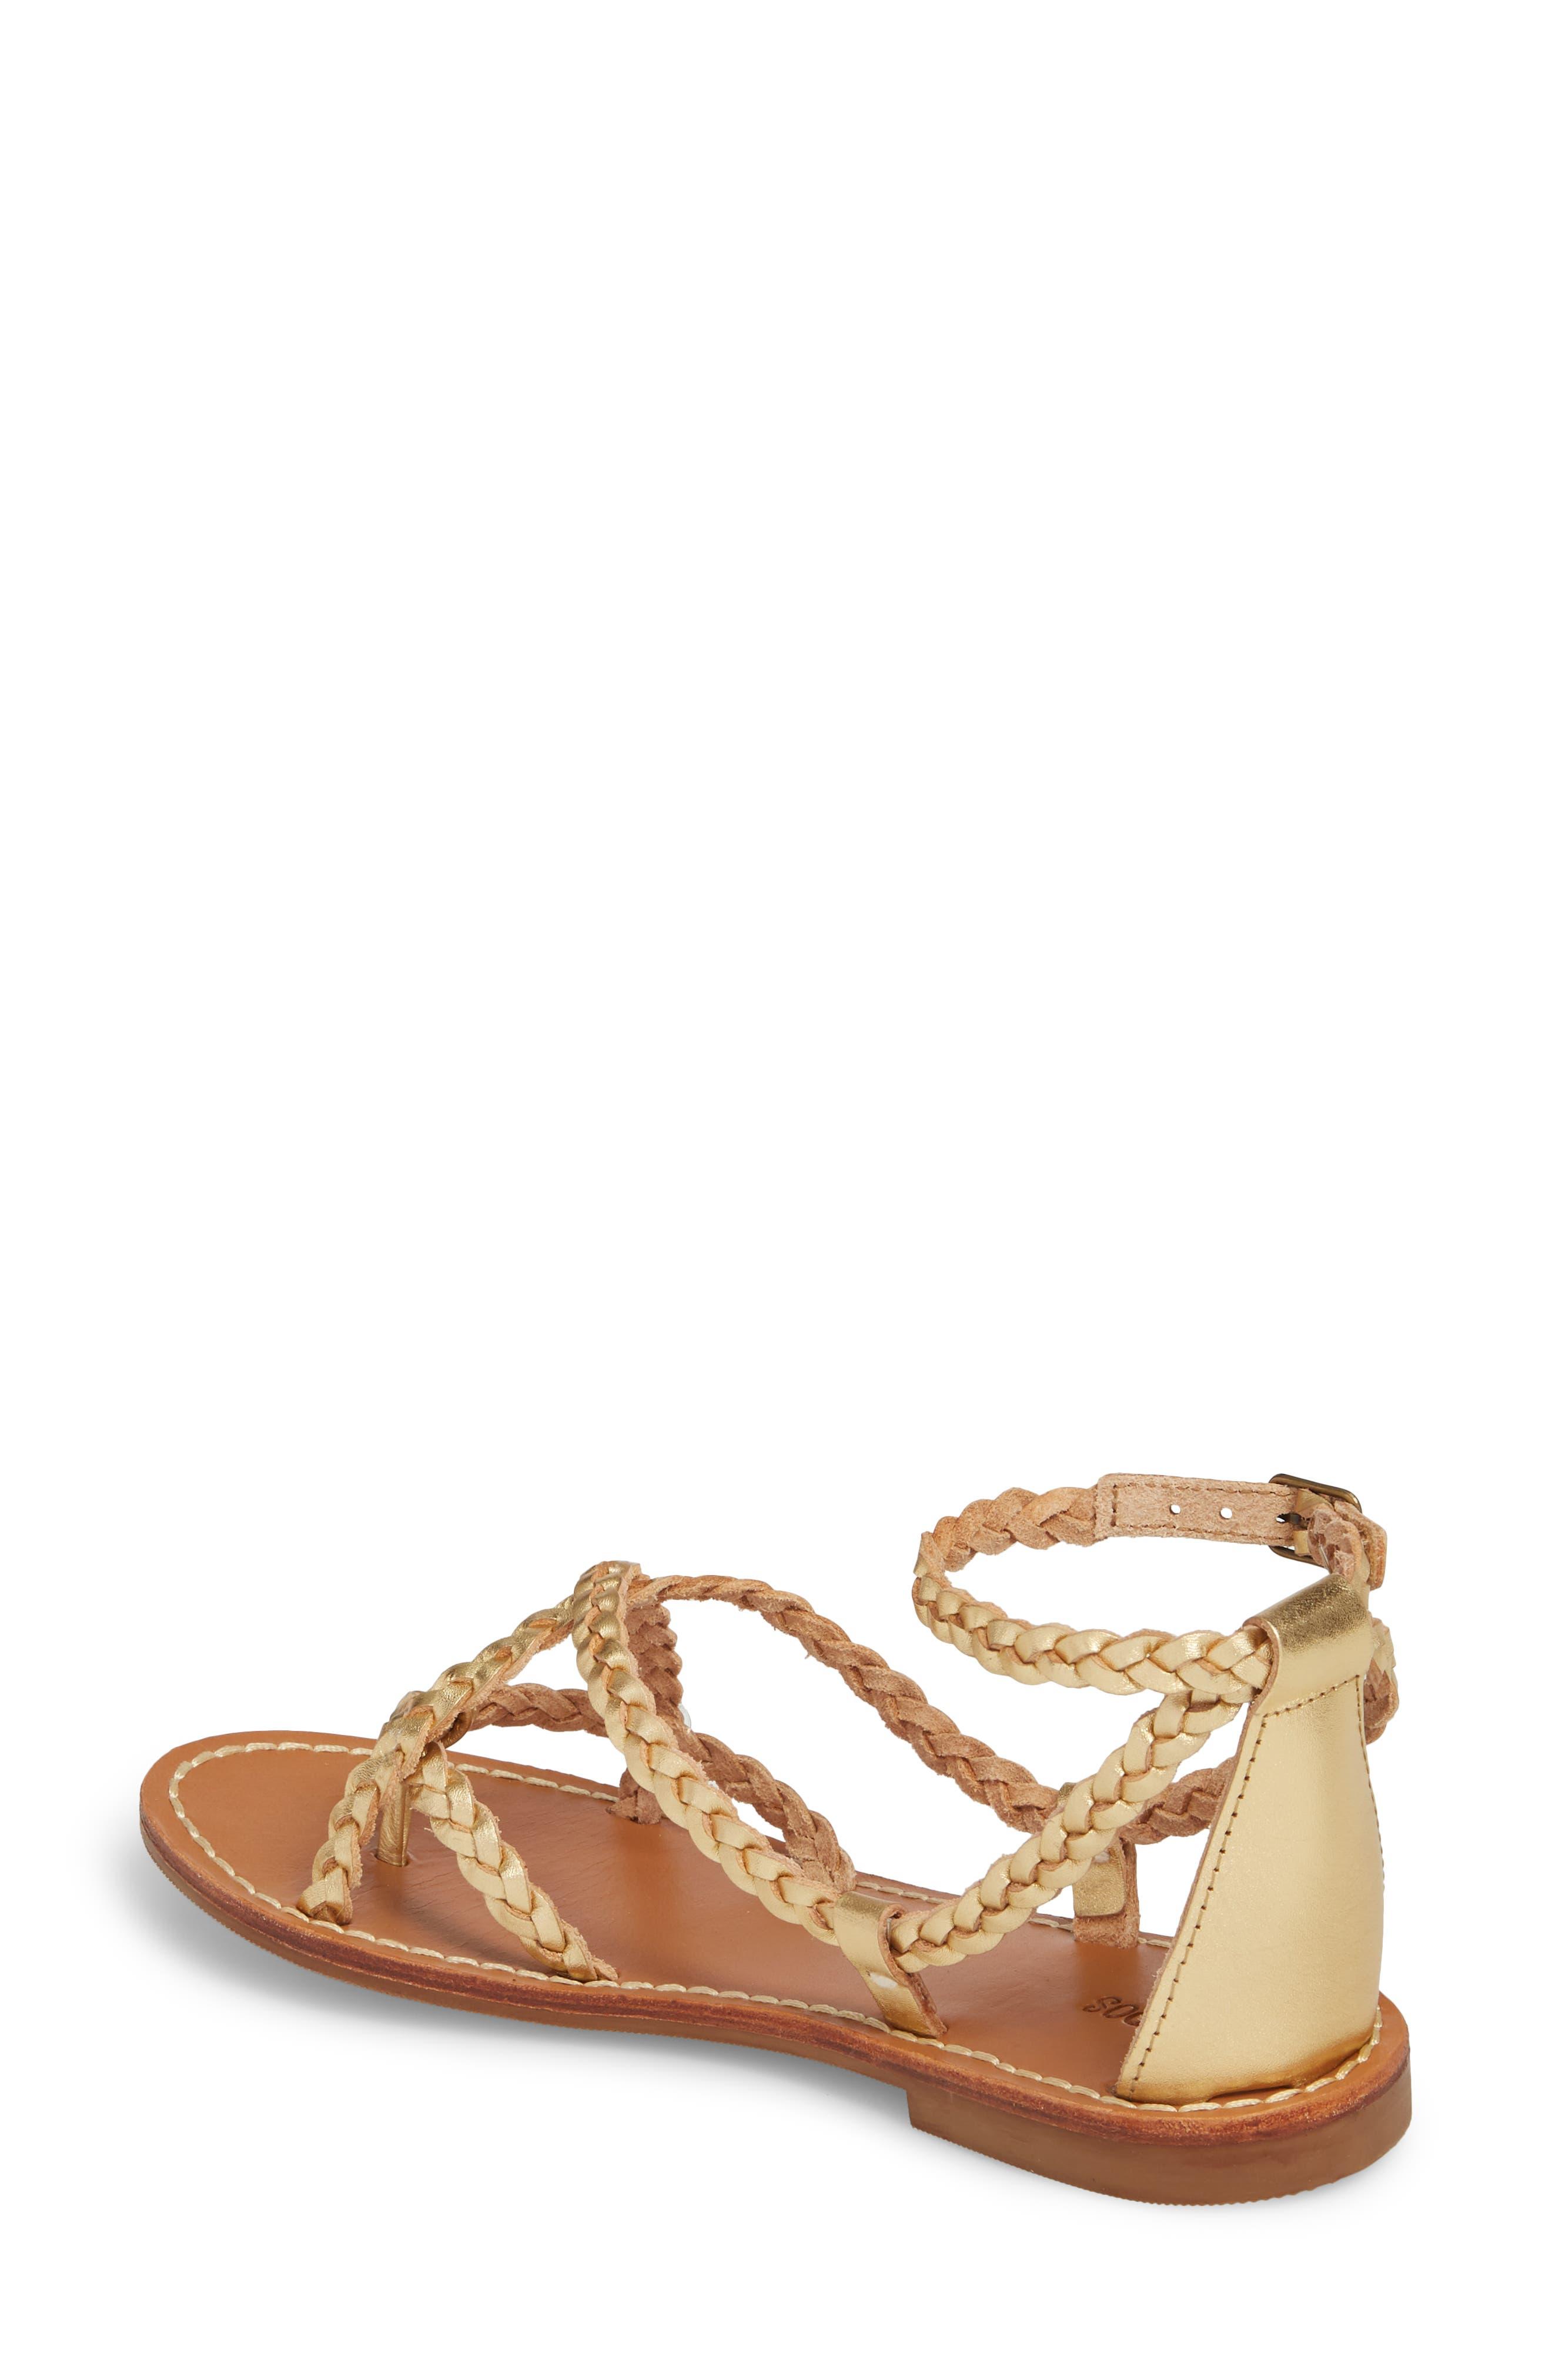 Amalfi Braided Metallic Sandal,                             Alternate thumbnail 2, color,                             Gold Leather